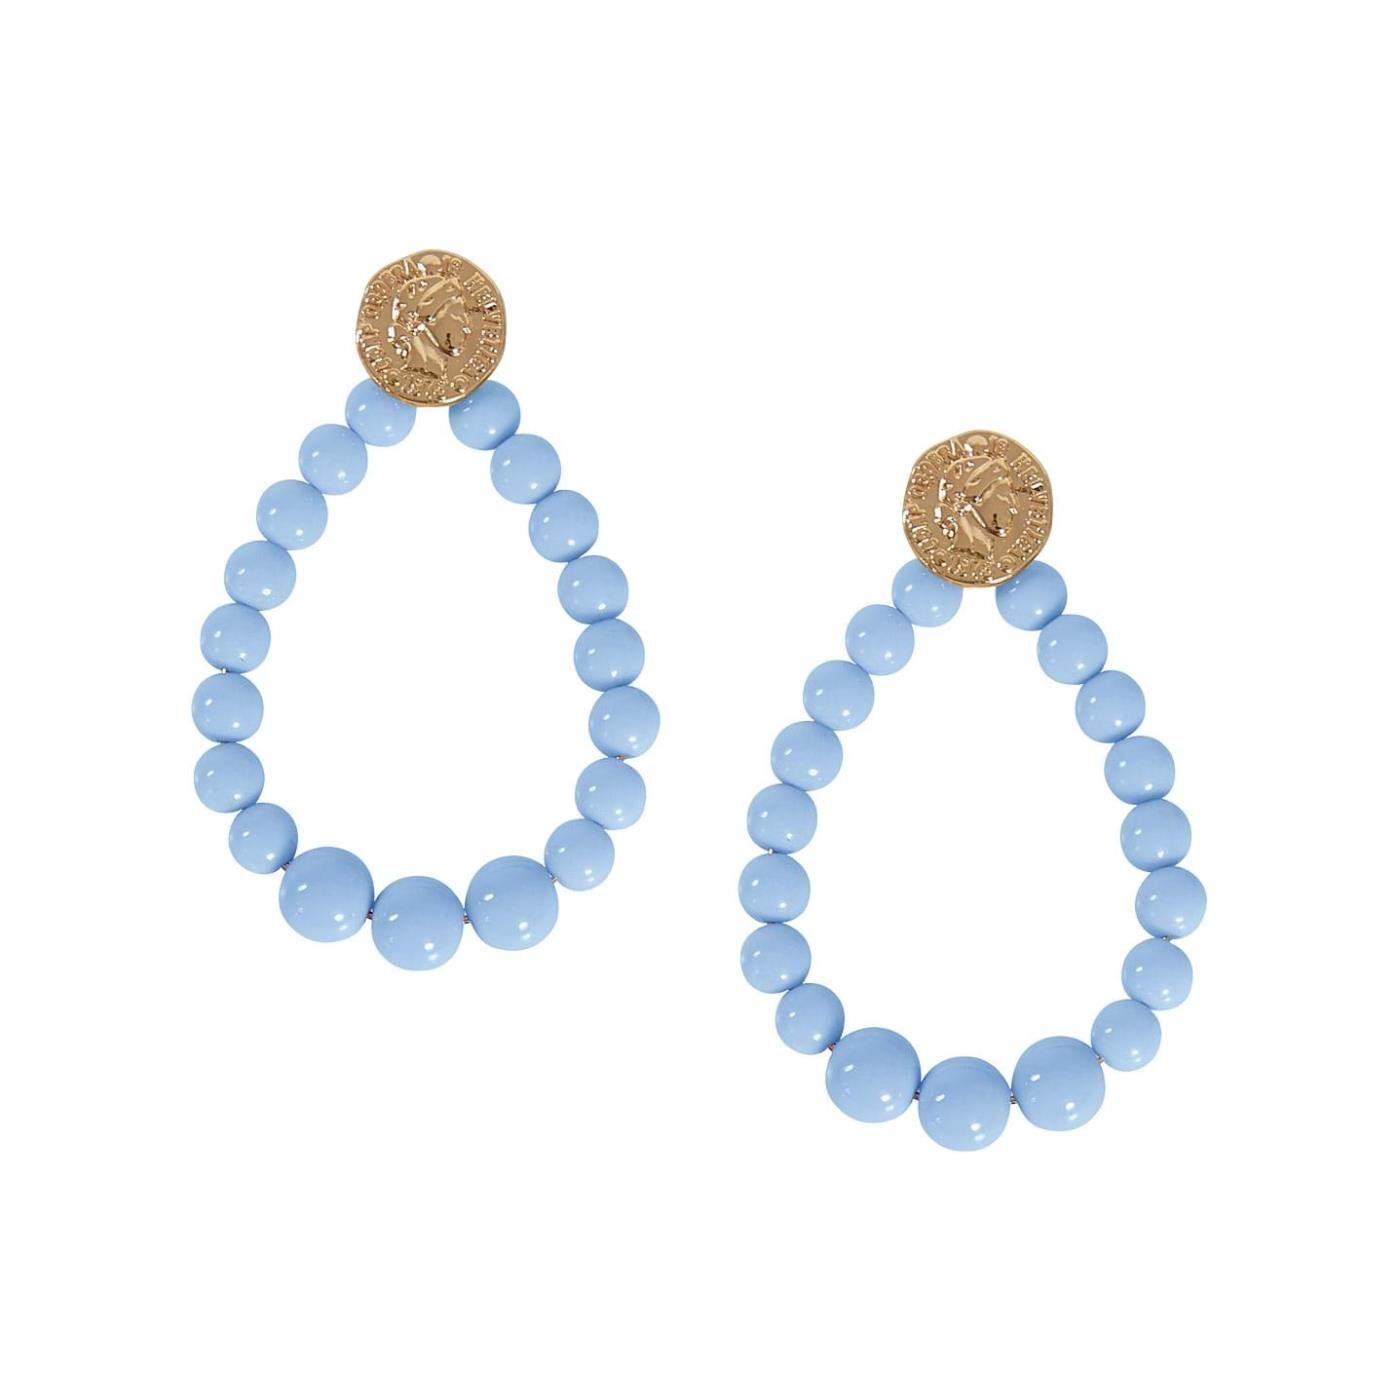 Celestino Κρεμαστά σκουλαρίκια με χάντρες  - Γαλαζιο - Grootte: One Size